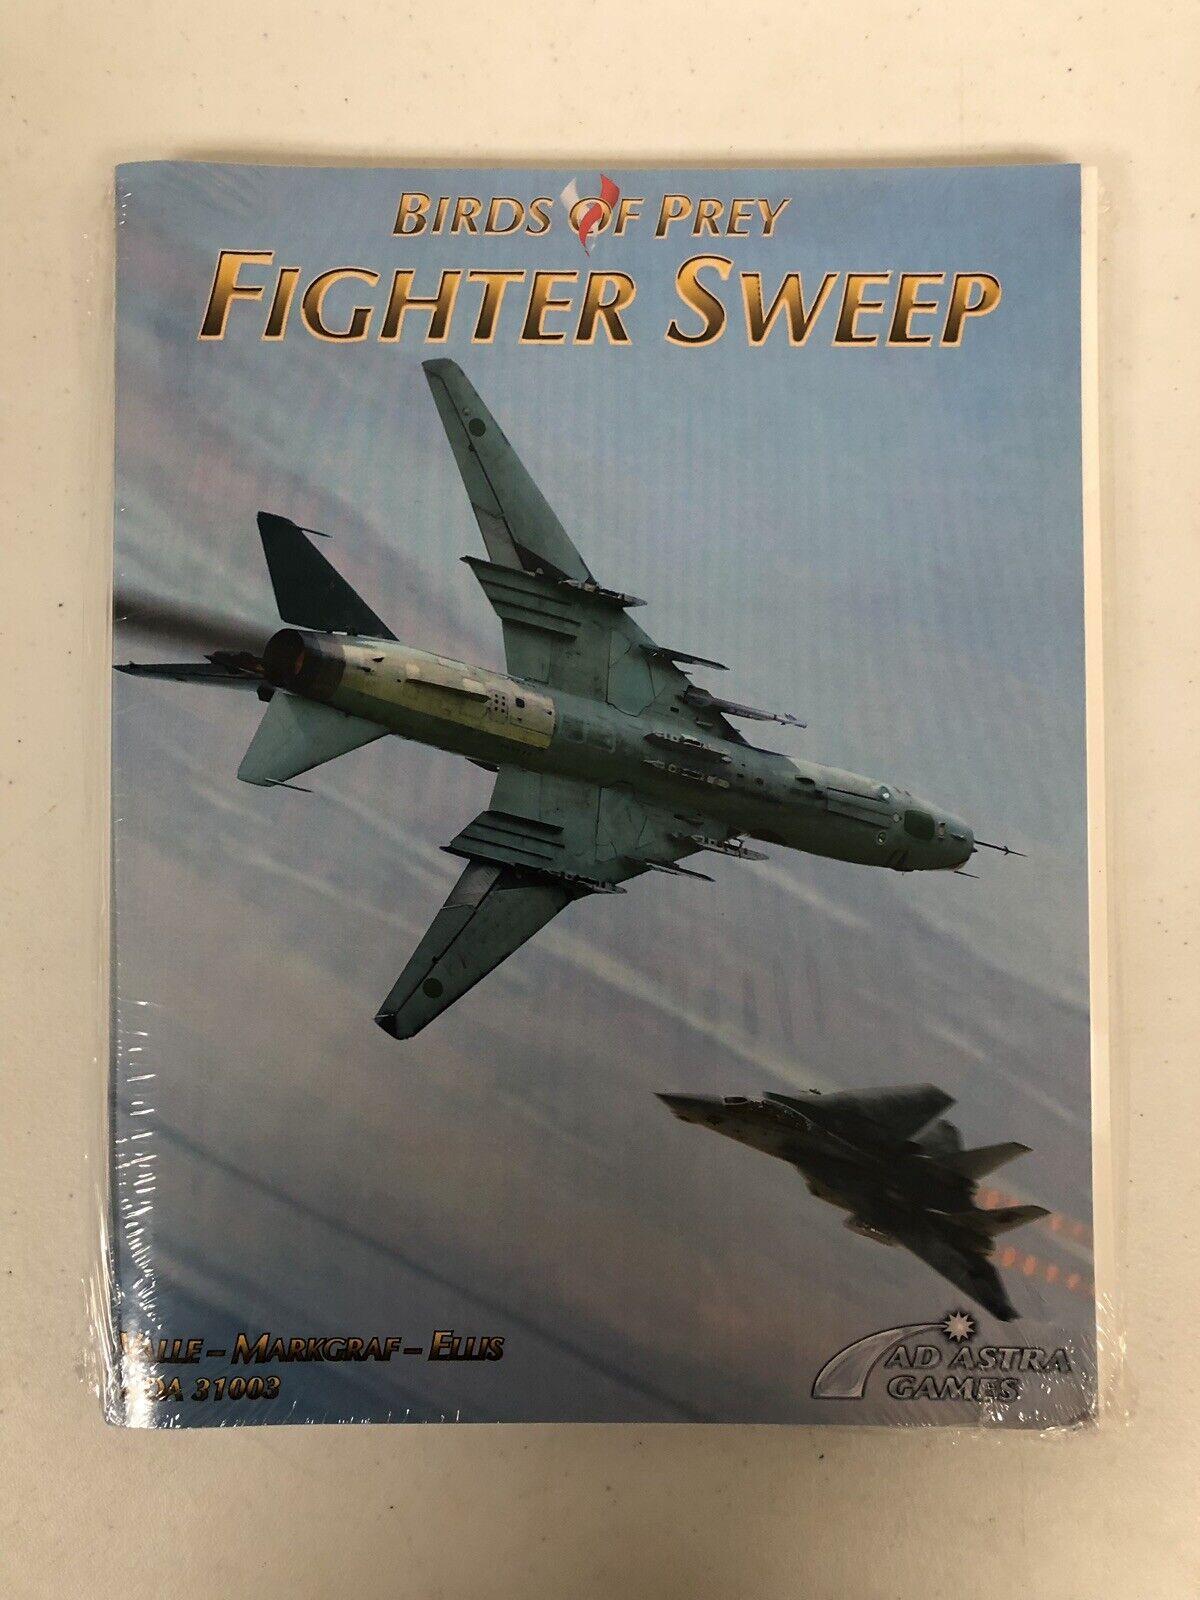 AD Astra juegos Fighter barrido Aves de presa juegos de guerra Valle-Markgraf-Ellis